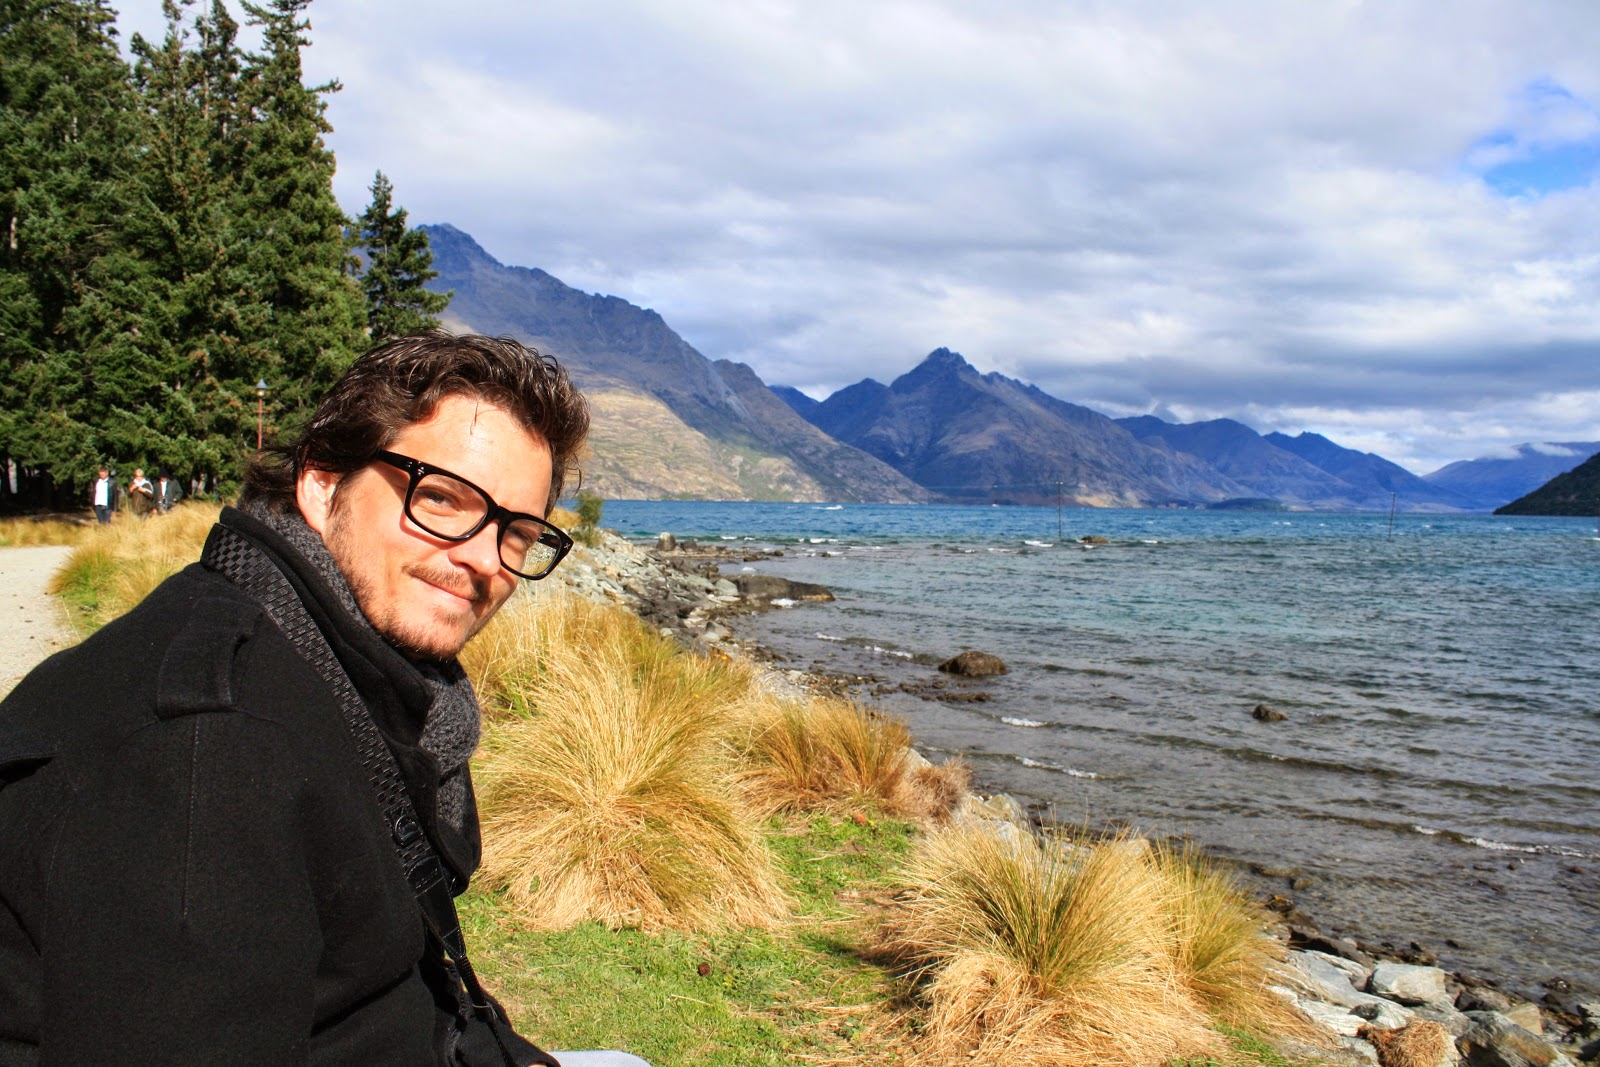 Jesse near Tussock grass at Lake Wakatipu, Queenstown.